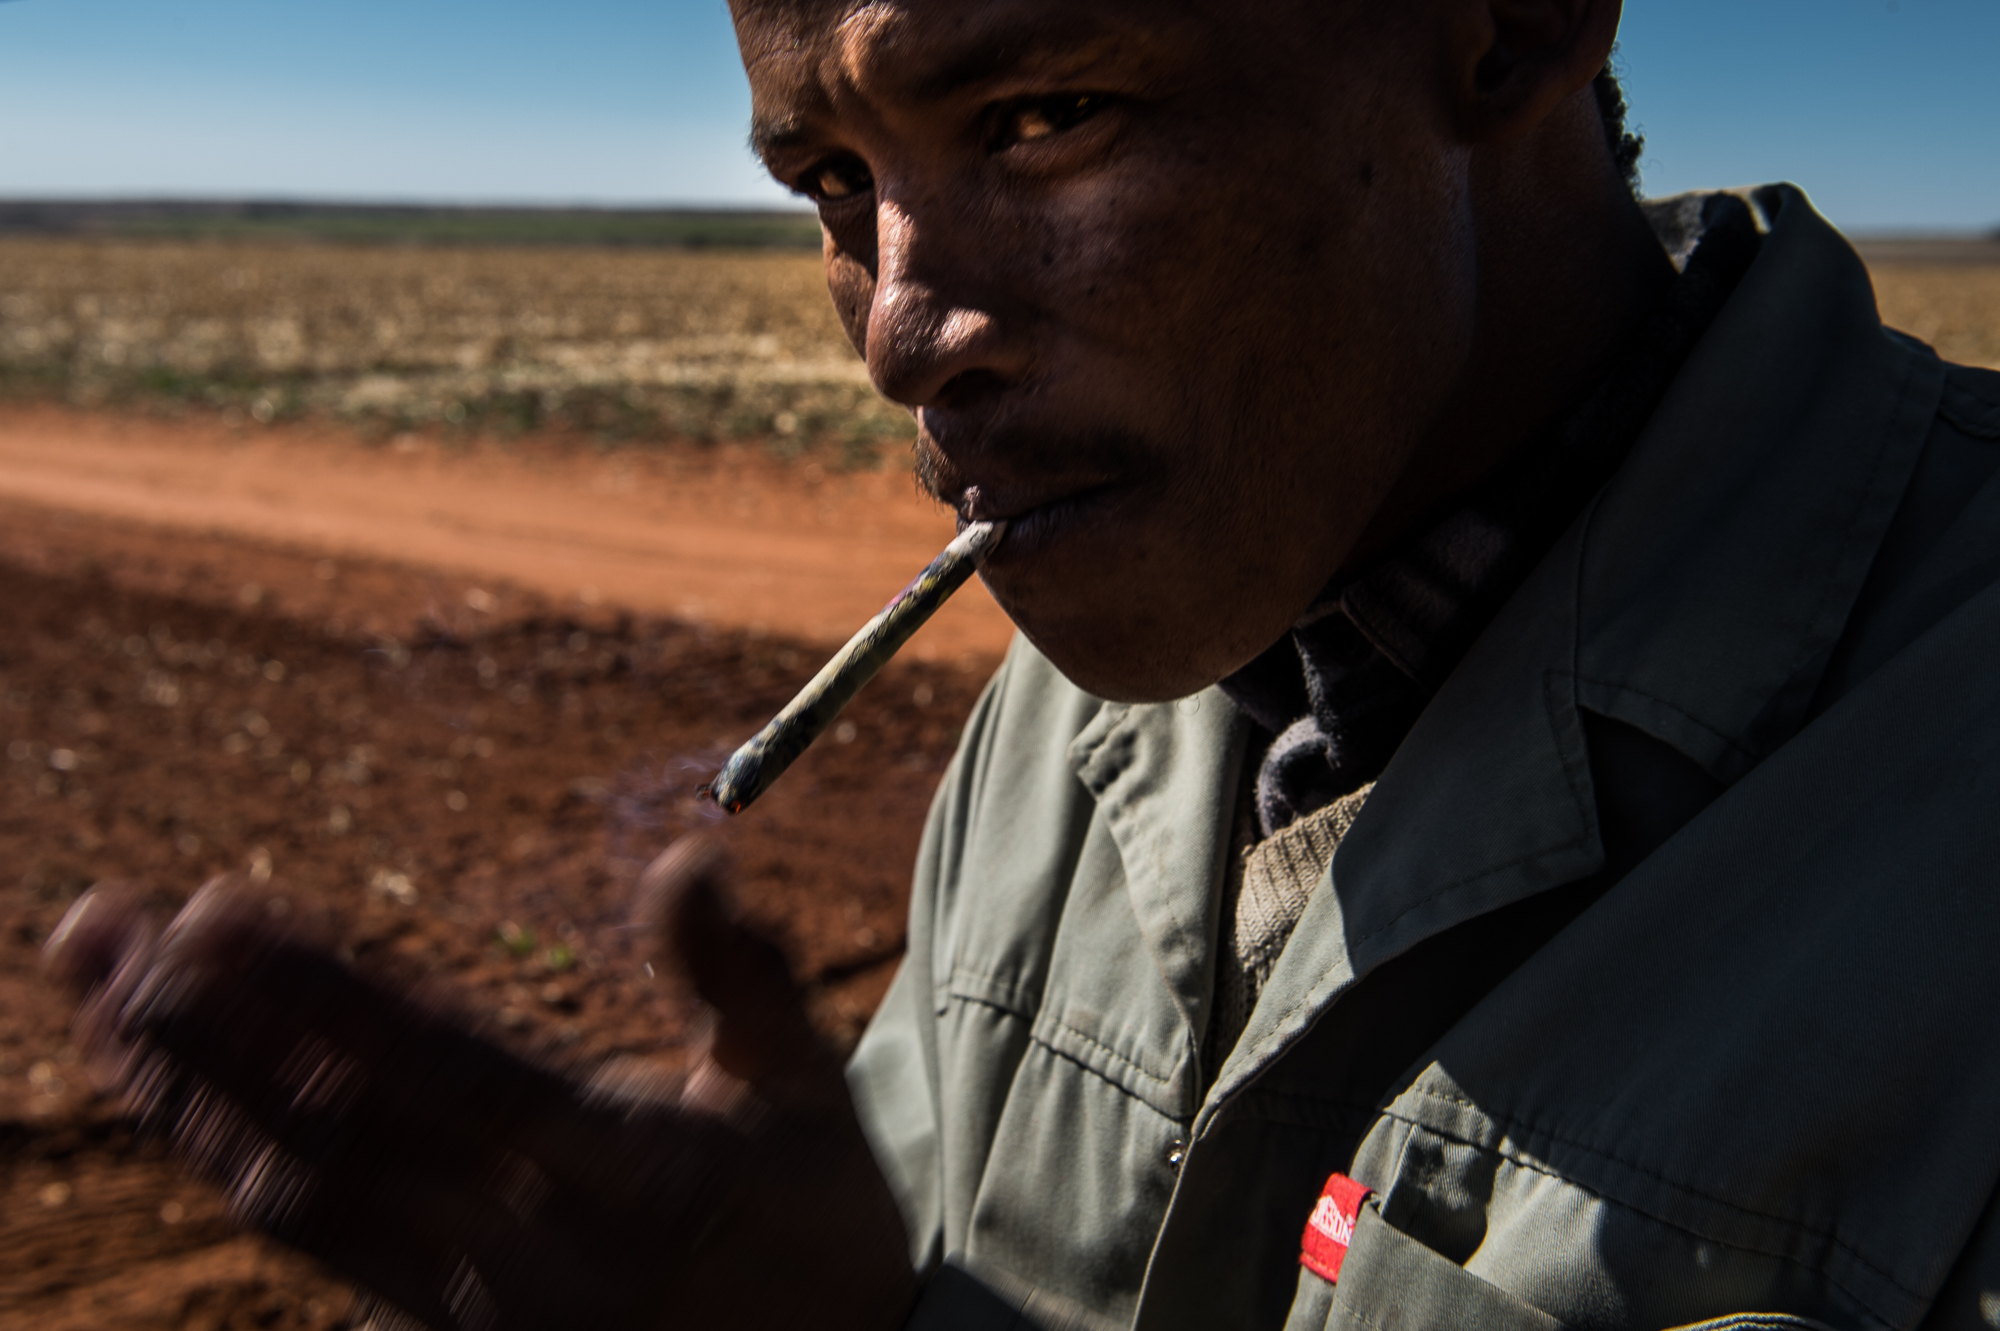 South Africa, Northern Cape, 02.08.2018 // A farmworker smoking during a break of work on the fields. // Lucas Bäuml